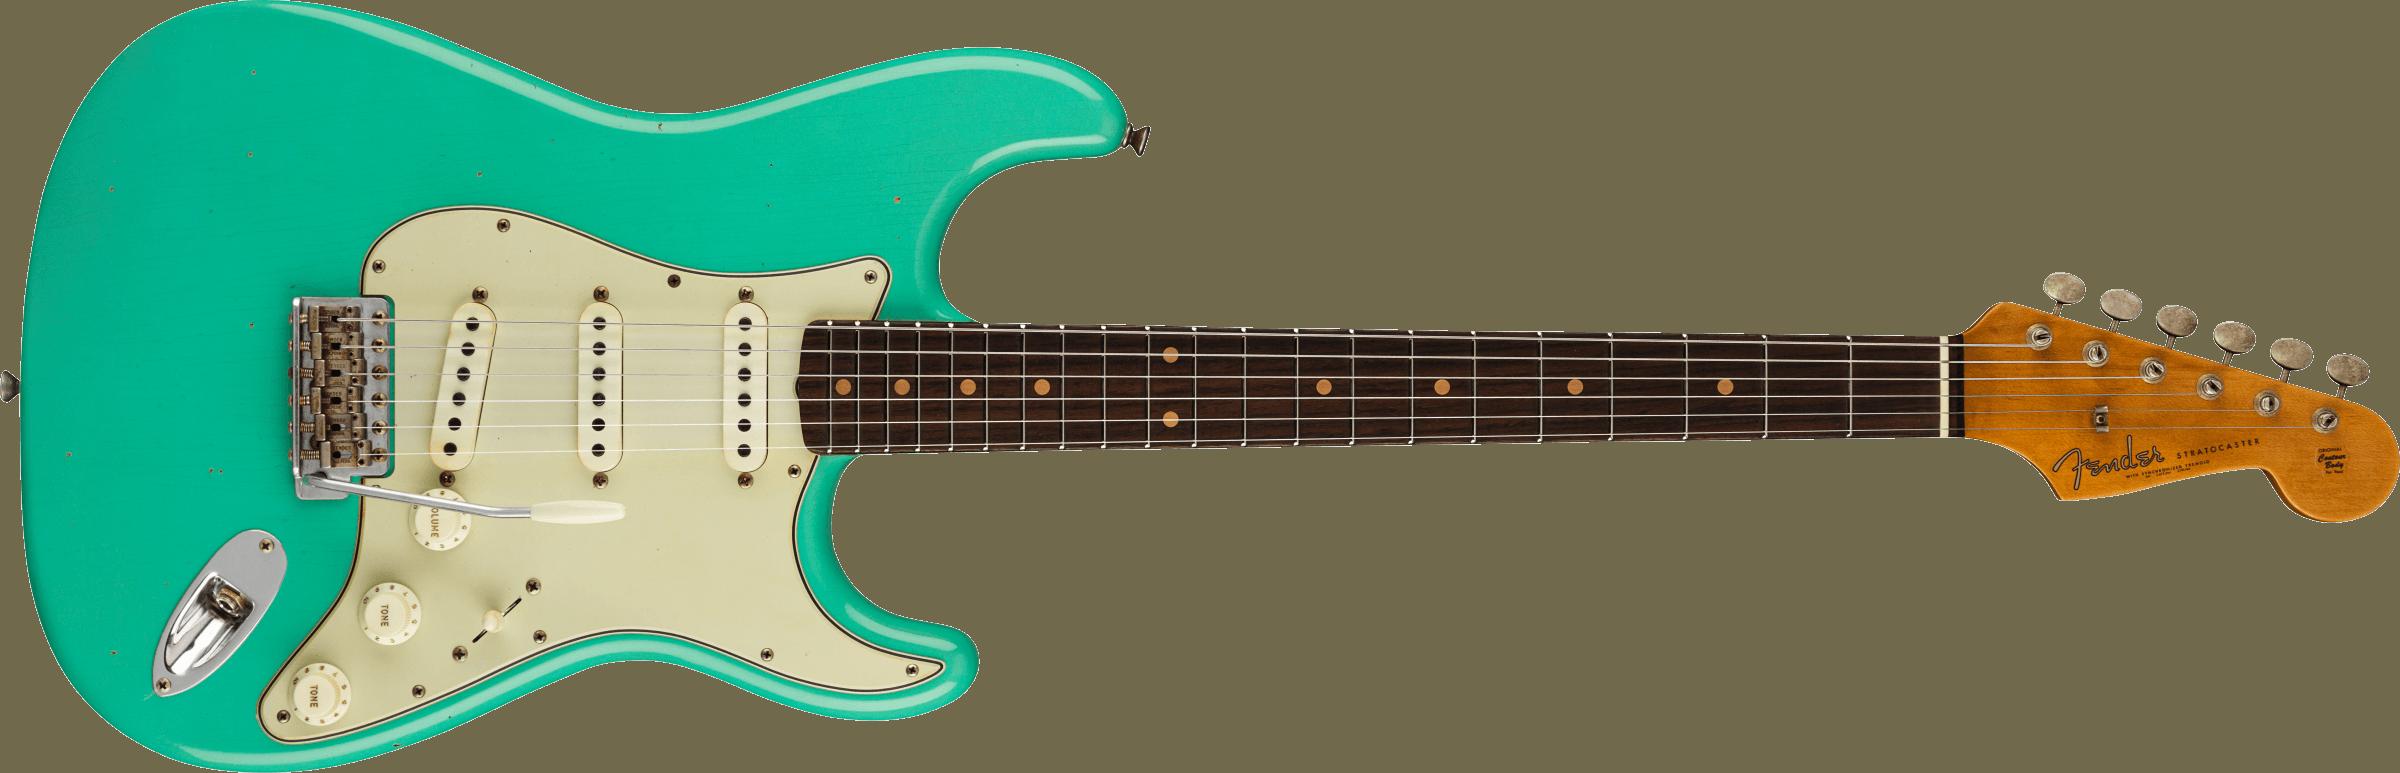 FENDER-Limited-Edition-62-63-Stratocaster-Journeyman-Relic-Rosewood-Fingerboard-Aged-Seafoam-Green-sku-571005157